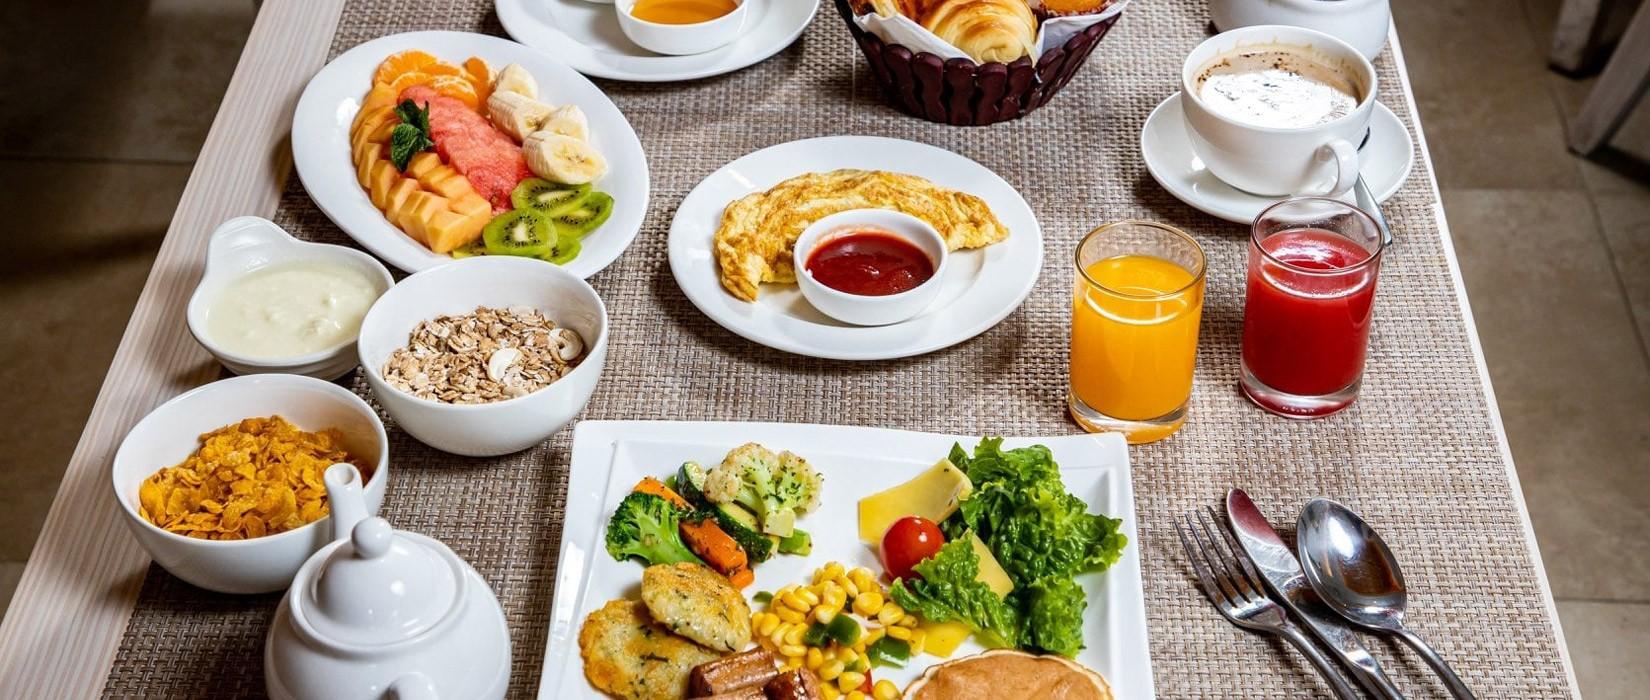 Arushi Boutique Hotel Breakfast